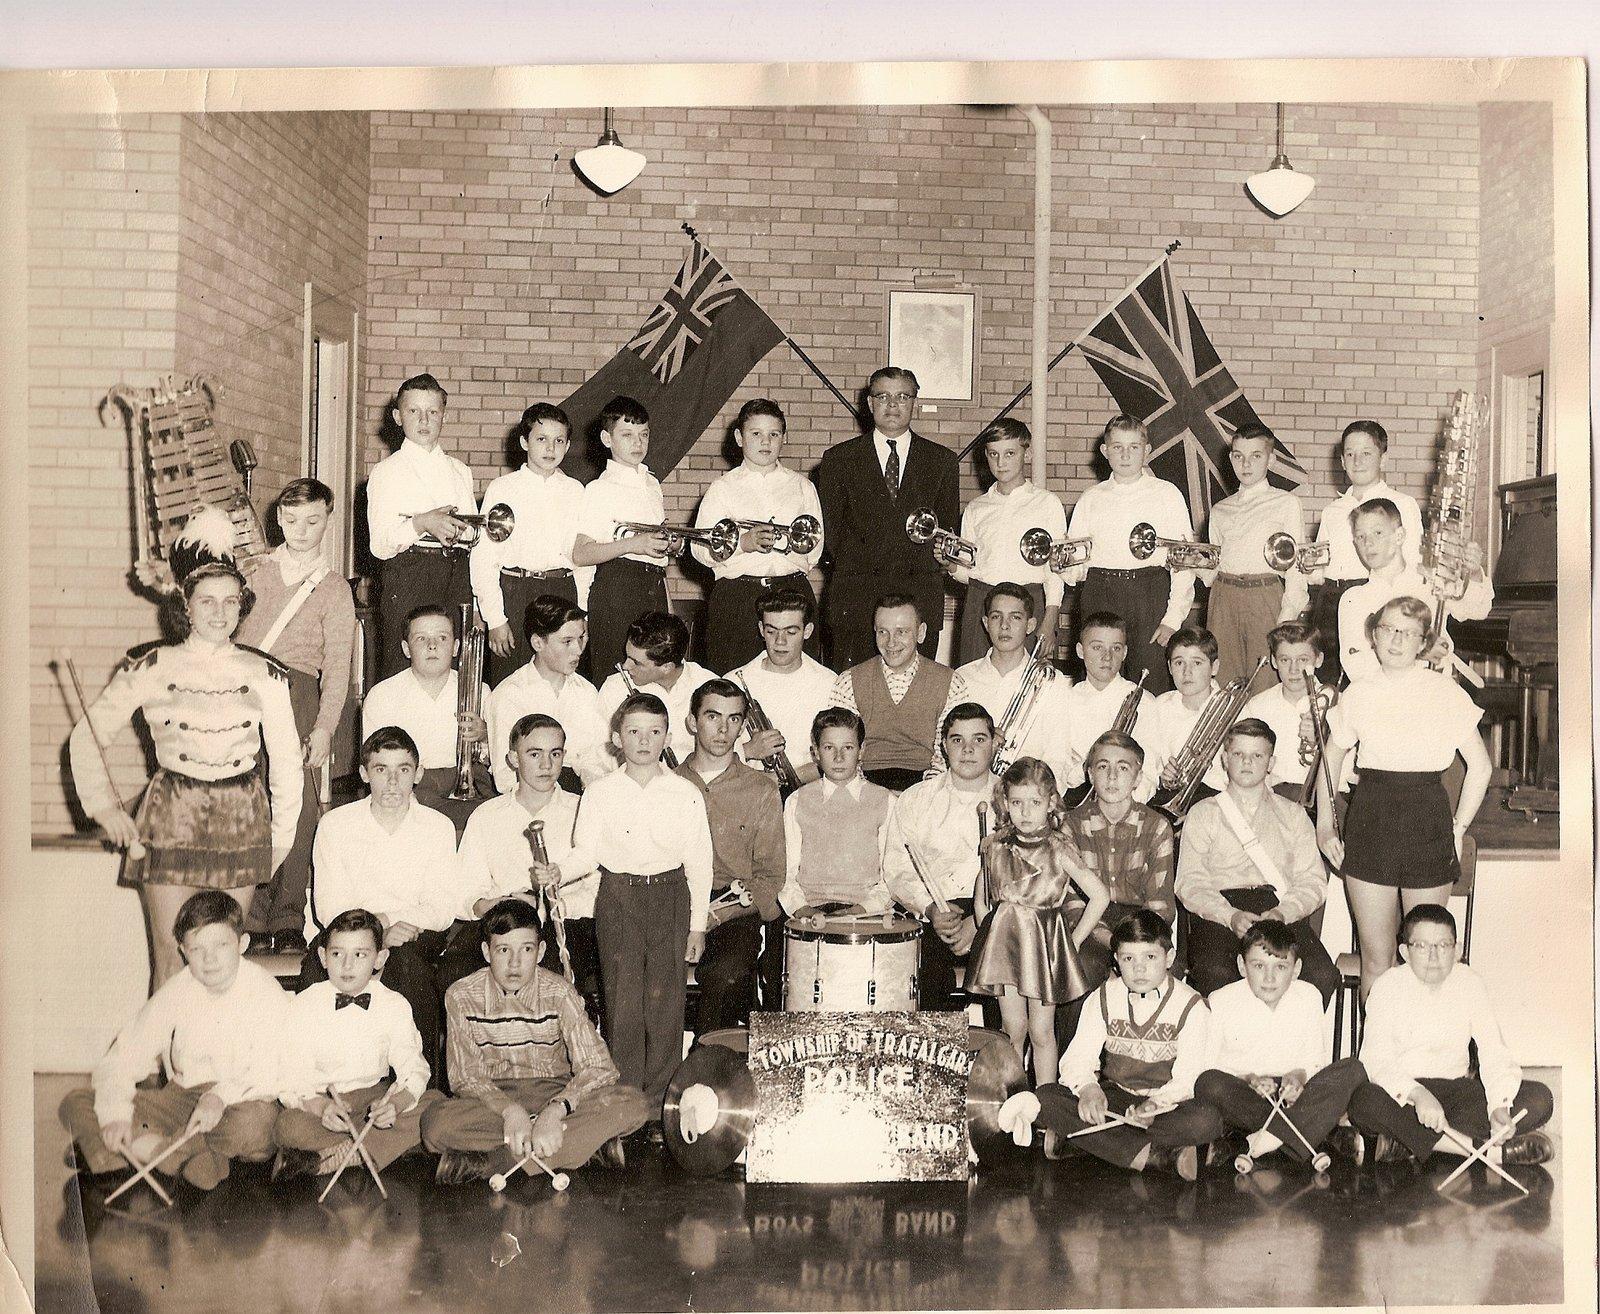 Township of Trafalgar Police Boys Band, Late 1950's